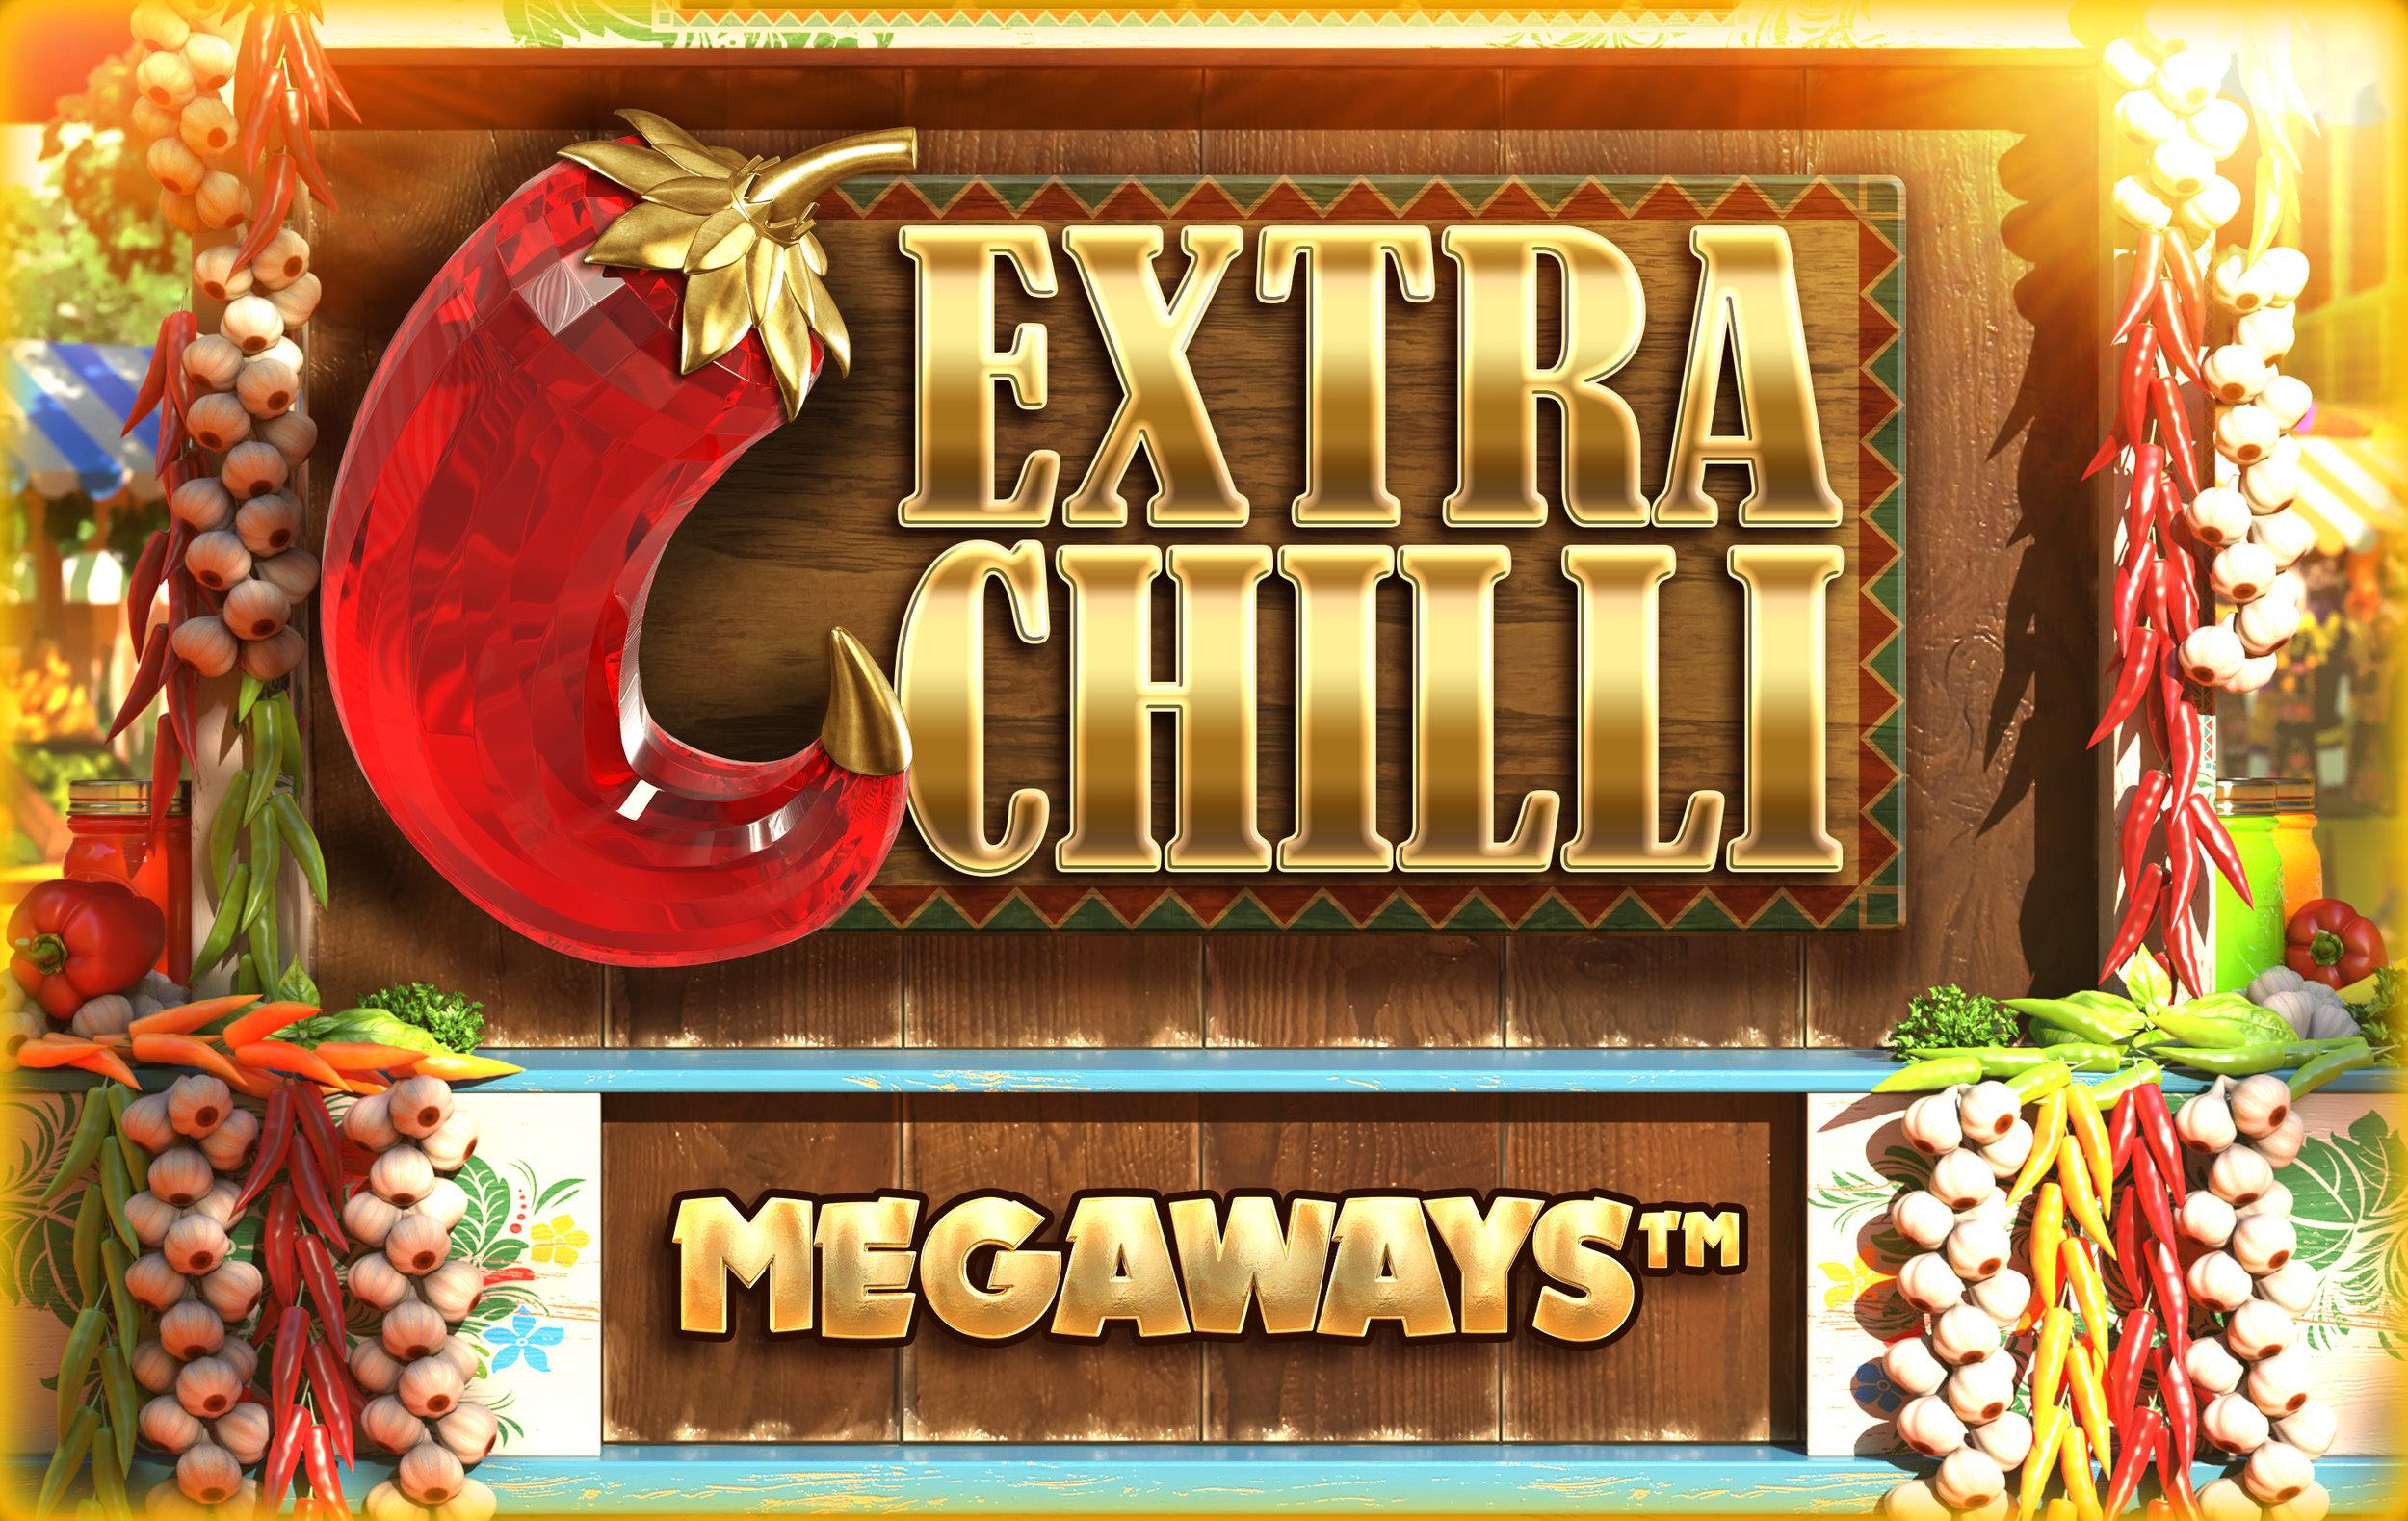 ExtraChilli-Belly.jpg